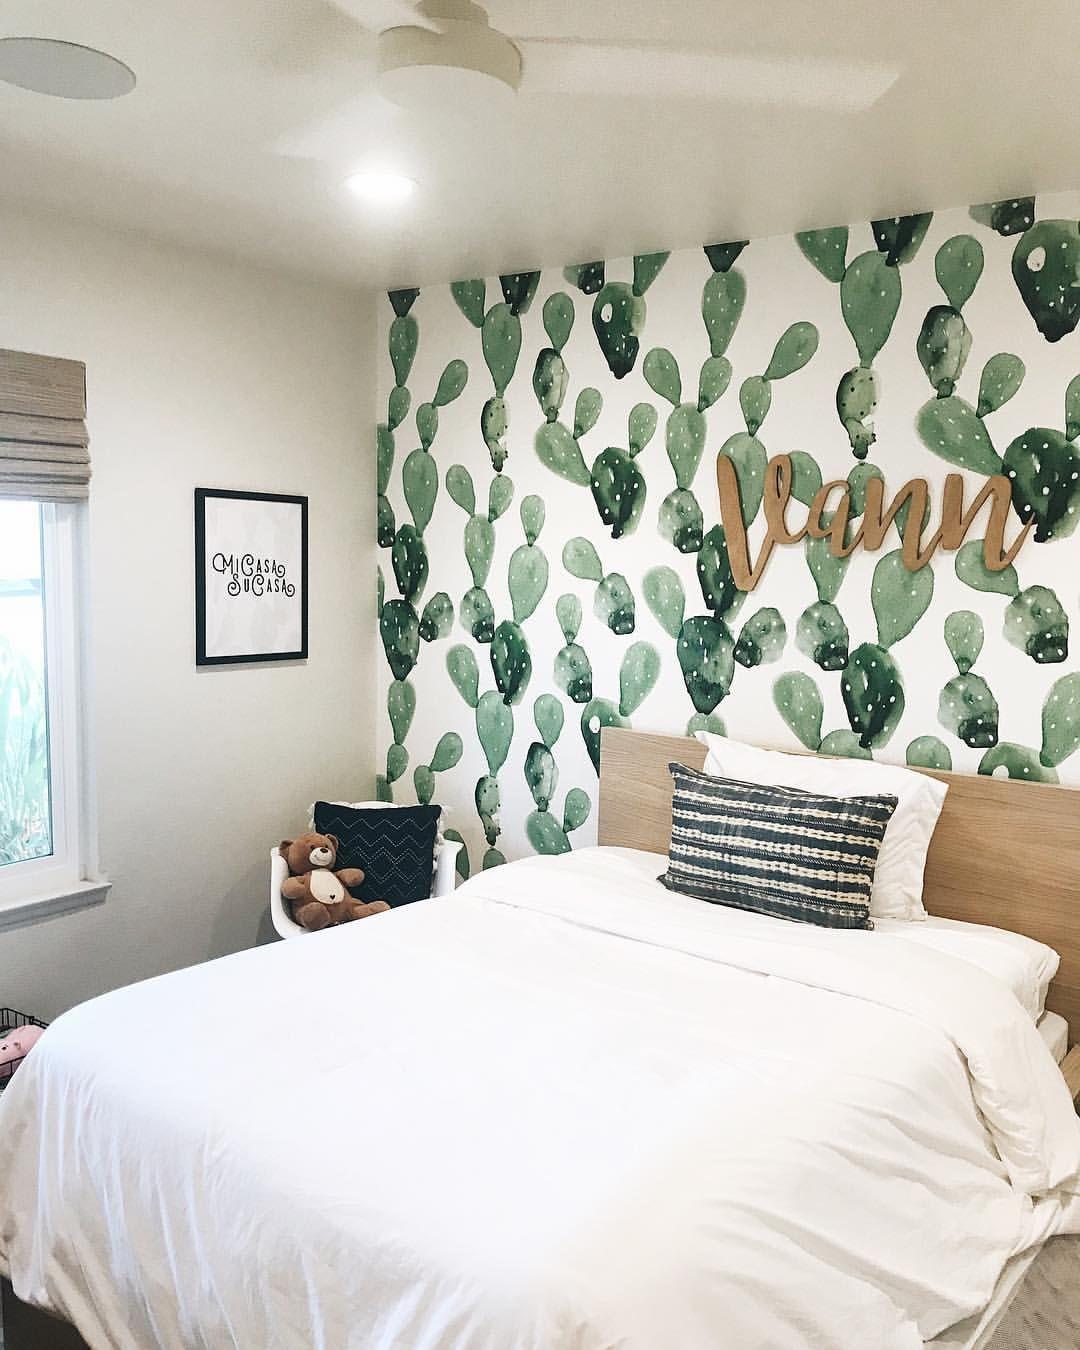 Cactus Room Idea Handmade Signs For Kids Rooms Wood Sign Homedecor Ideas Modwoodco Room Decor Baby Room Decor Home Decor